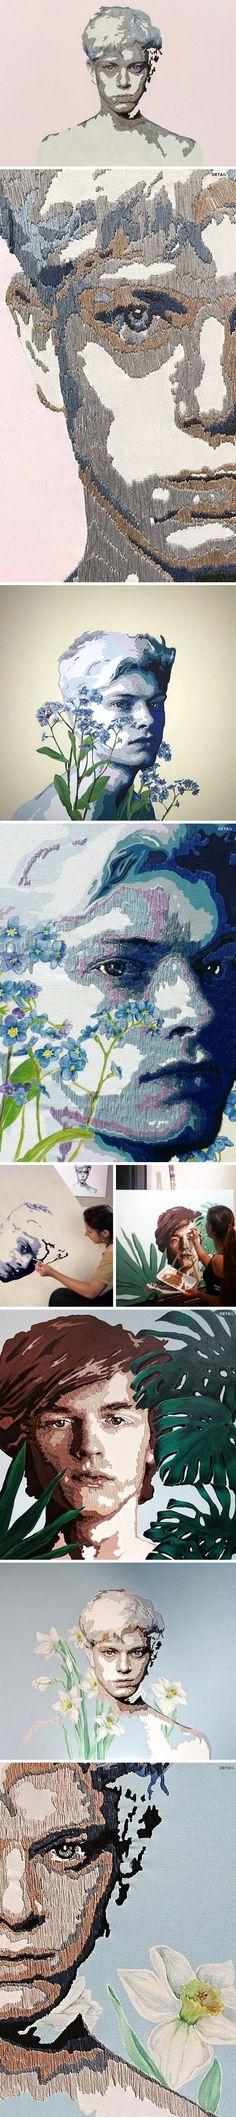 rana balca lker Contemporary Embroidery Contemporary Art